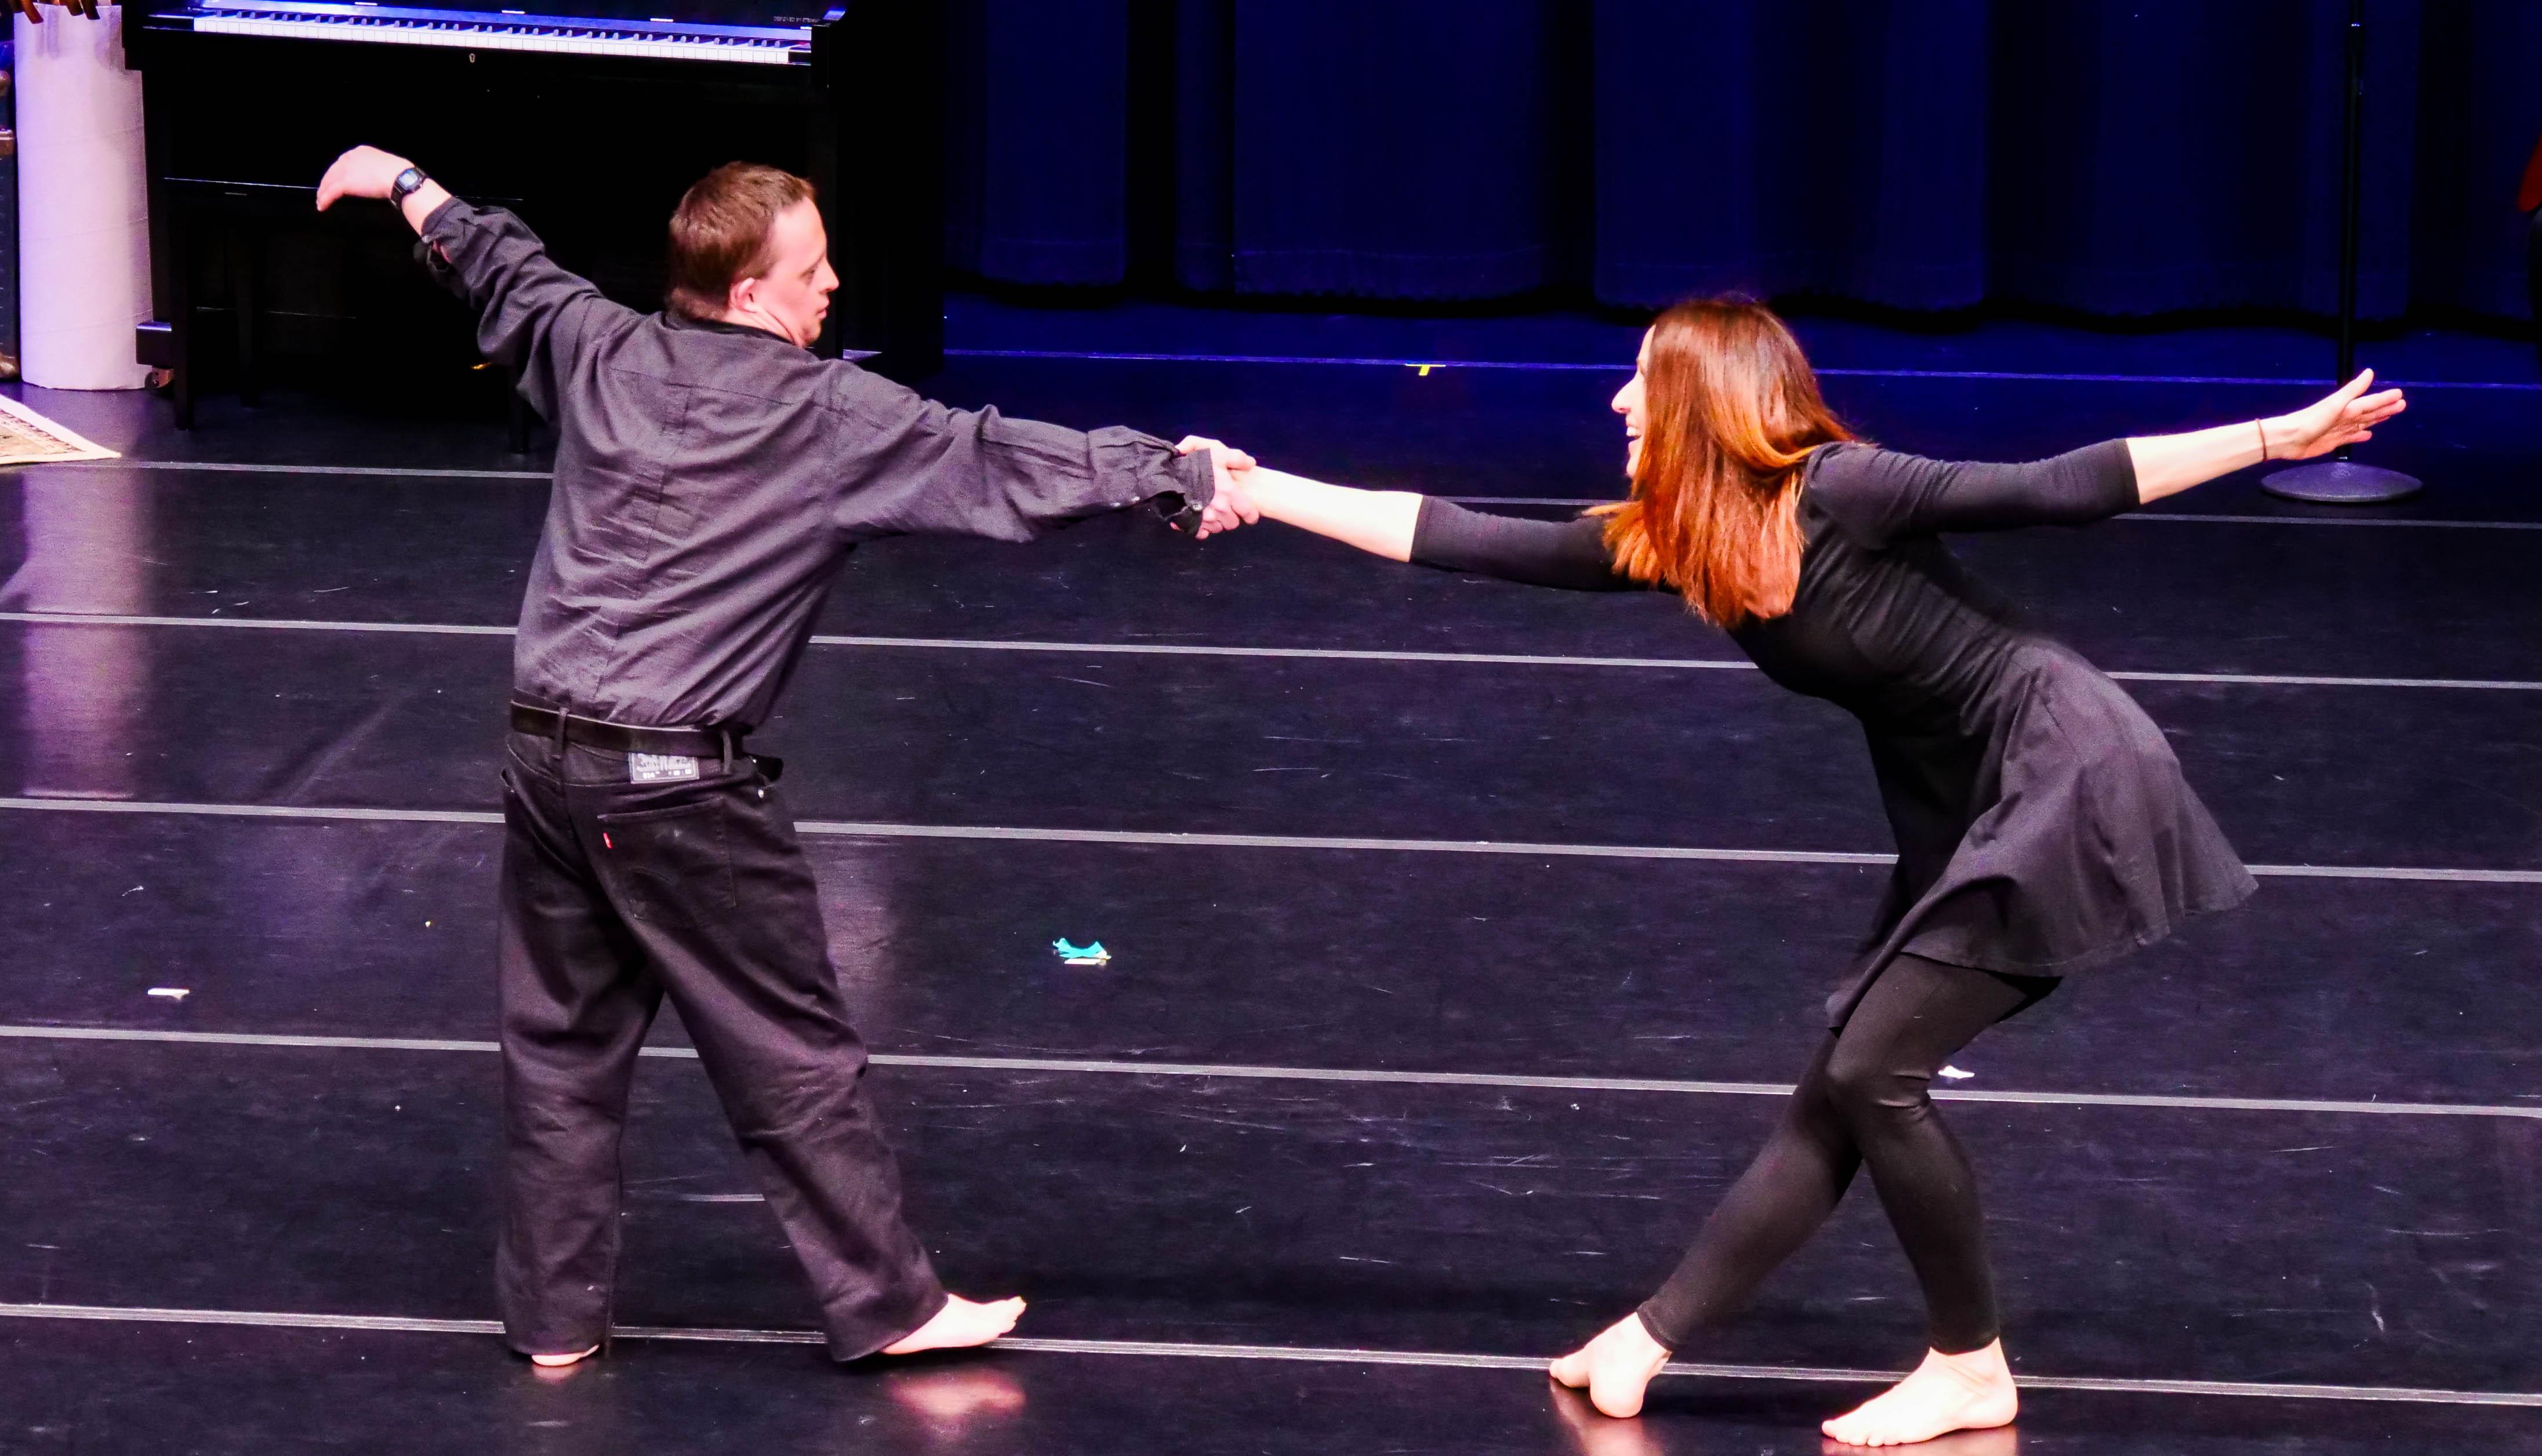 Tanner Dance | @theU